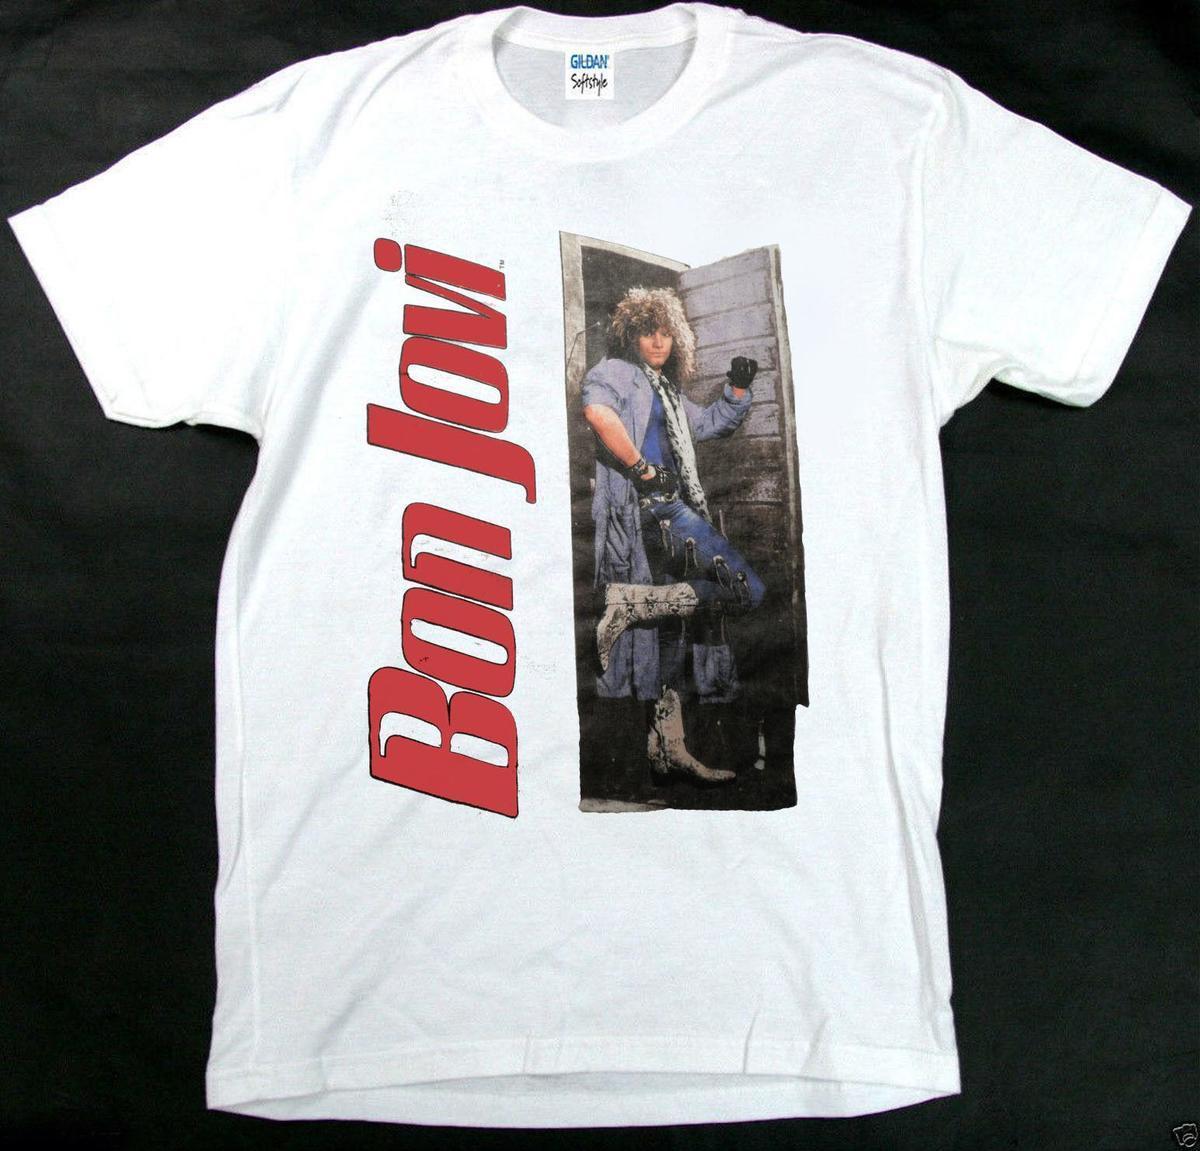 Vintage 80s concert t-shirts